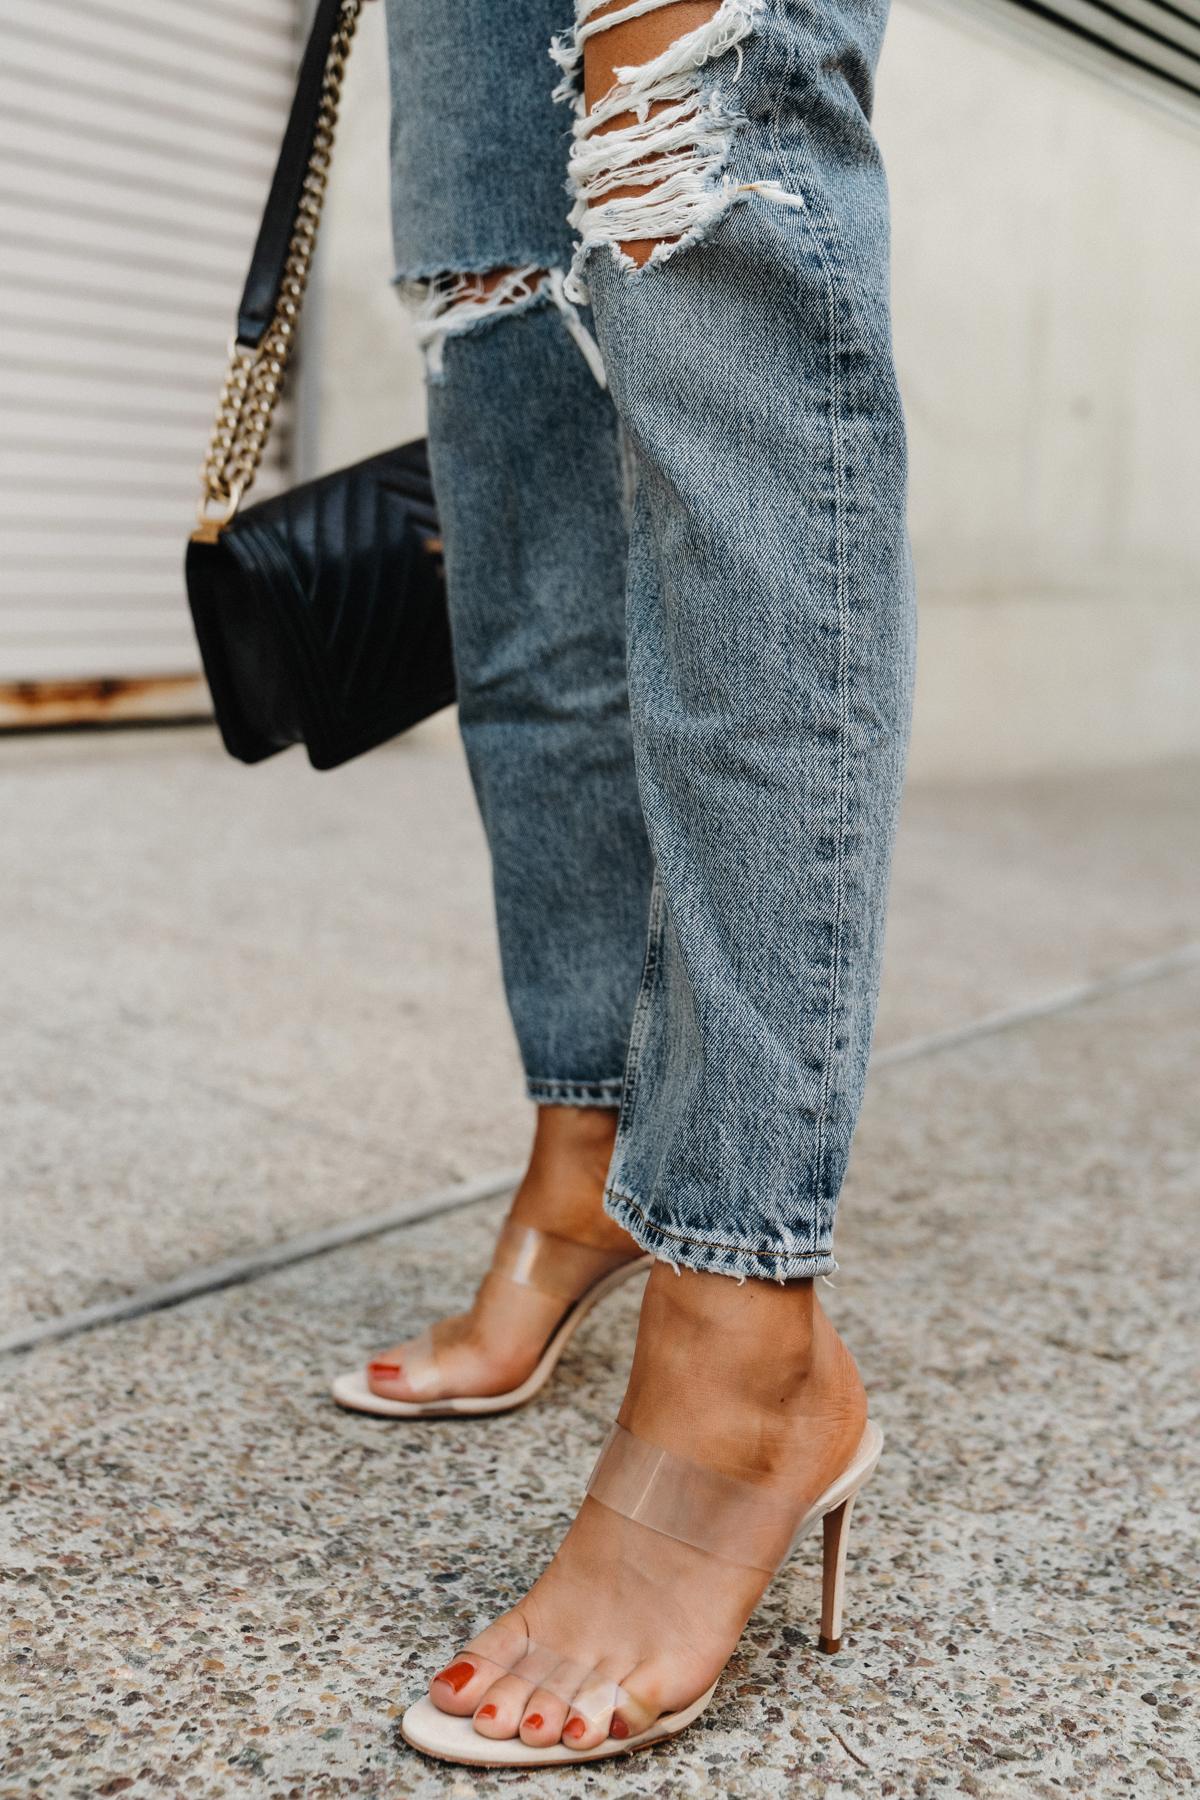 Fashion Jackson Wearing Schutz Ariella Sandals AGOLDE Ripped Jeans